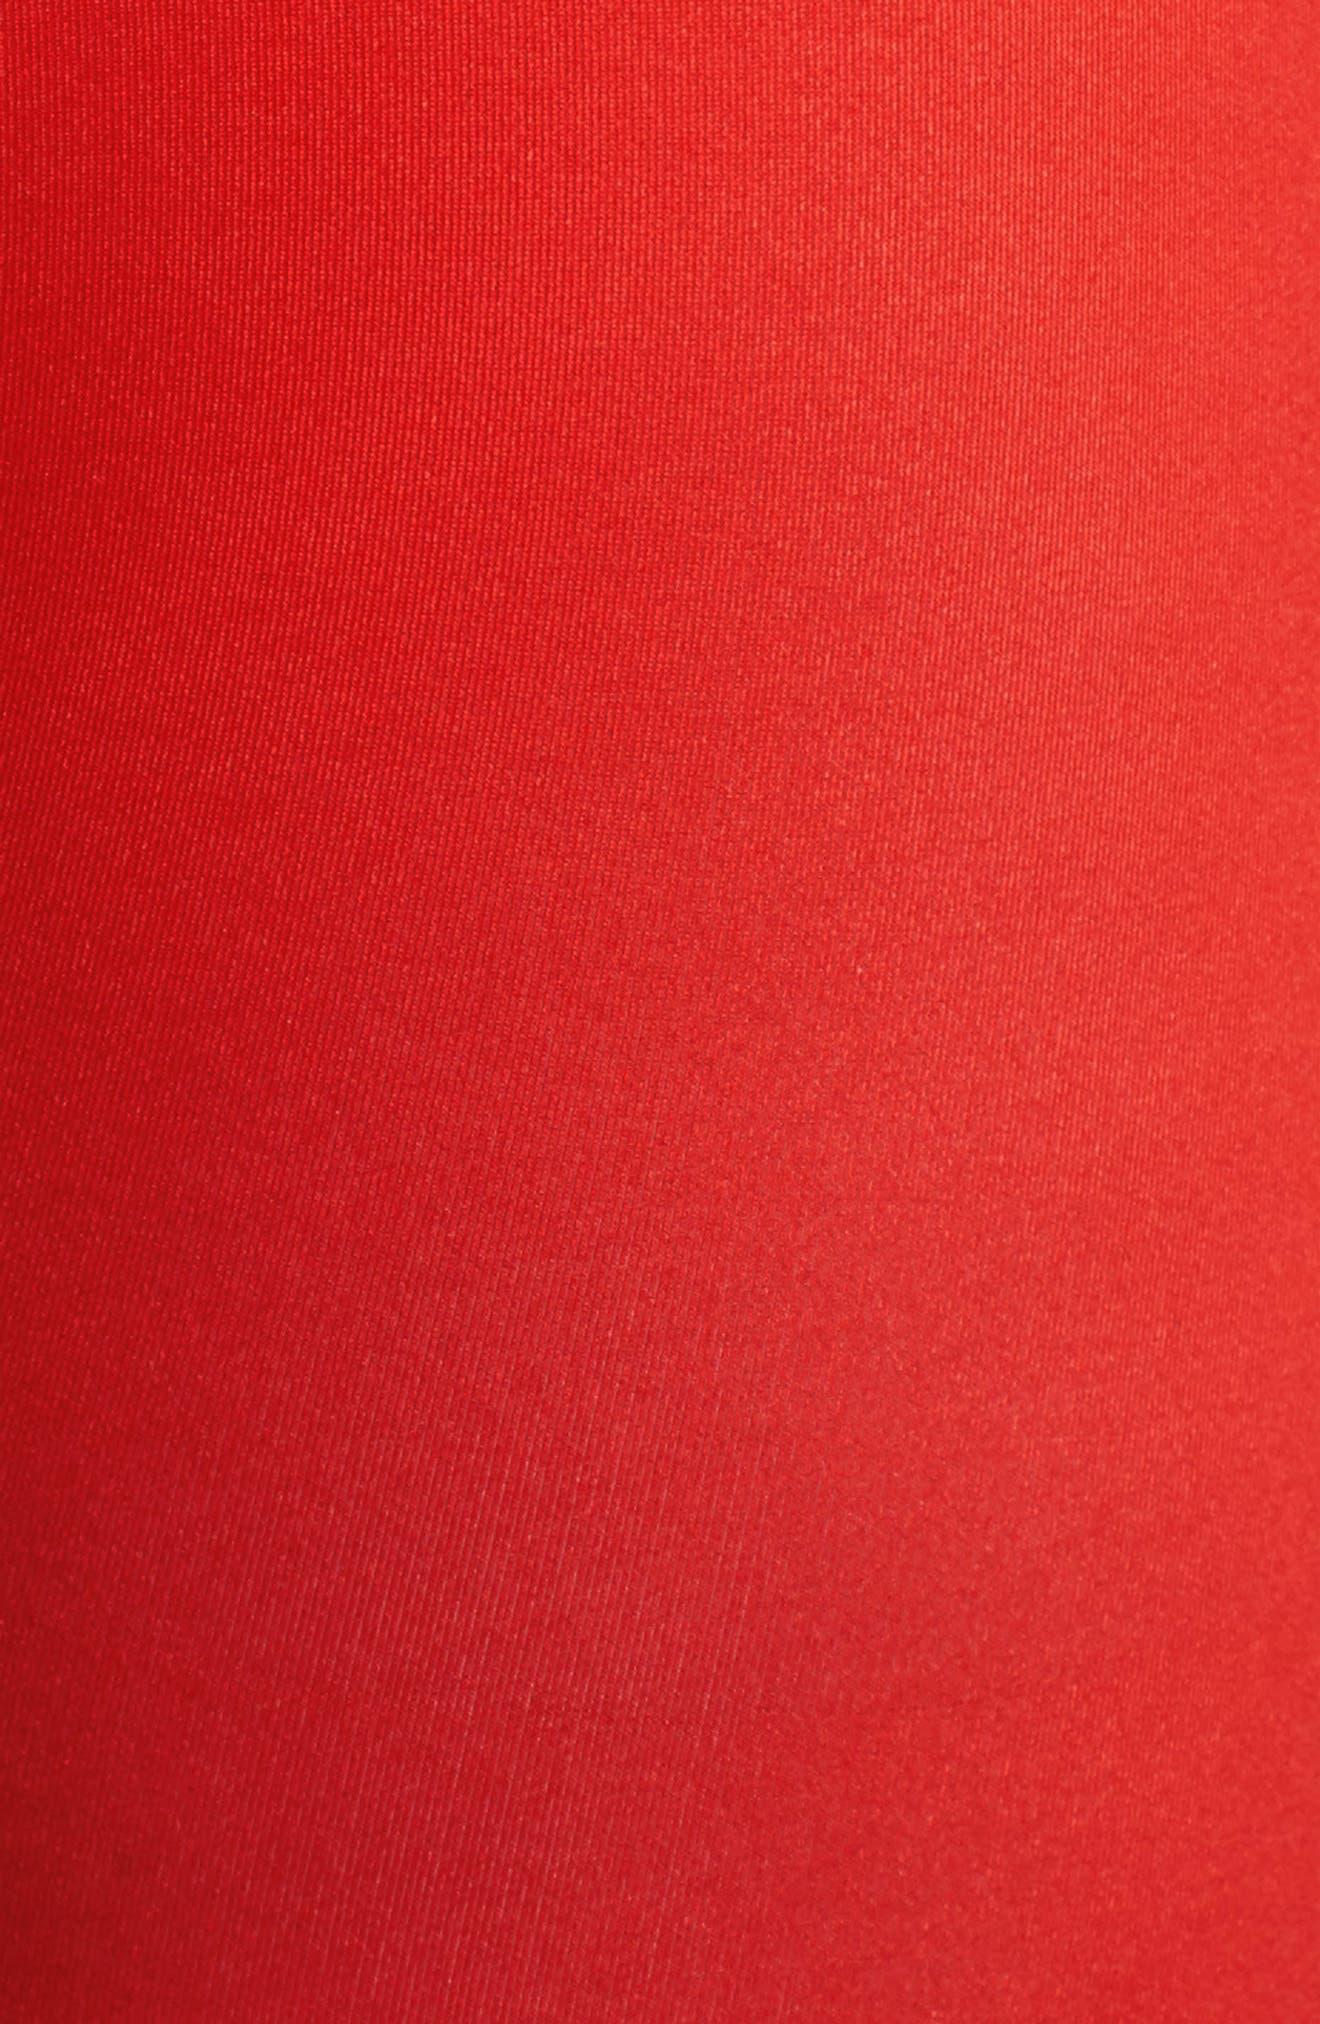 RWB Boxer Briefs,                             Alternate thumbnail 5, color,                             Red/ White/ Blue